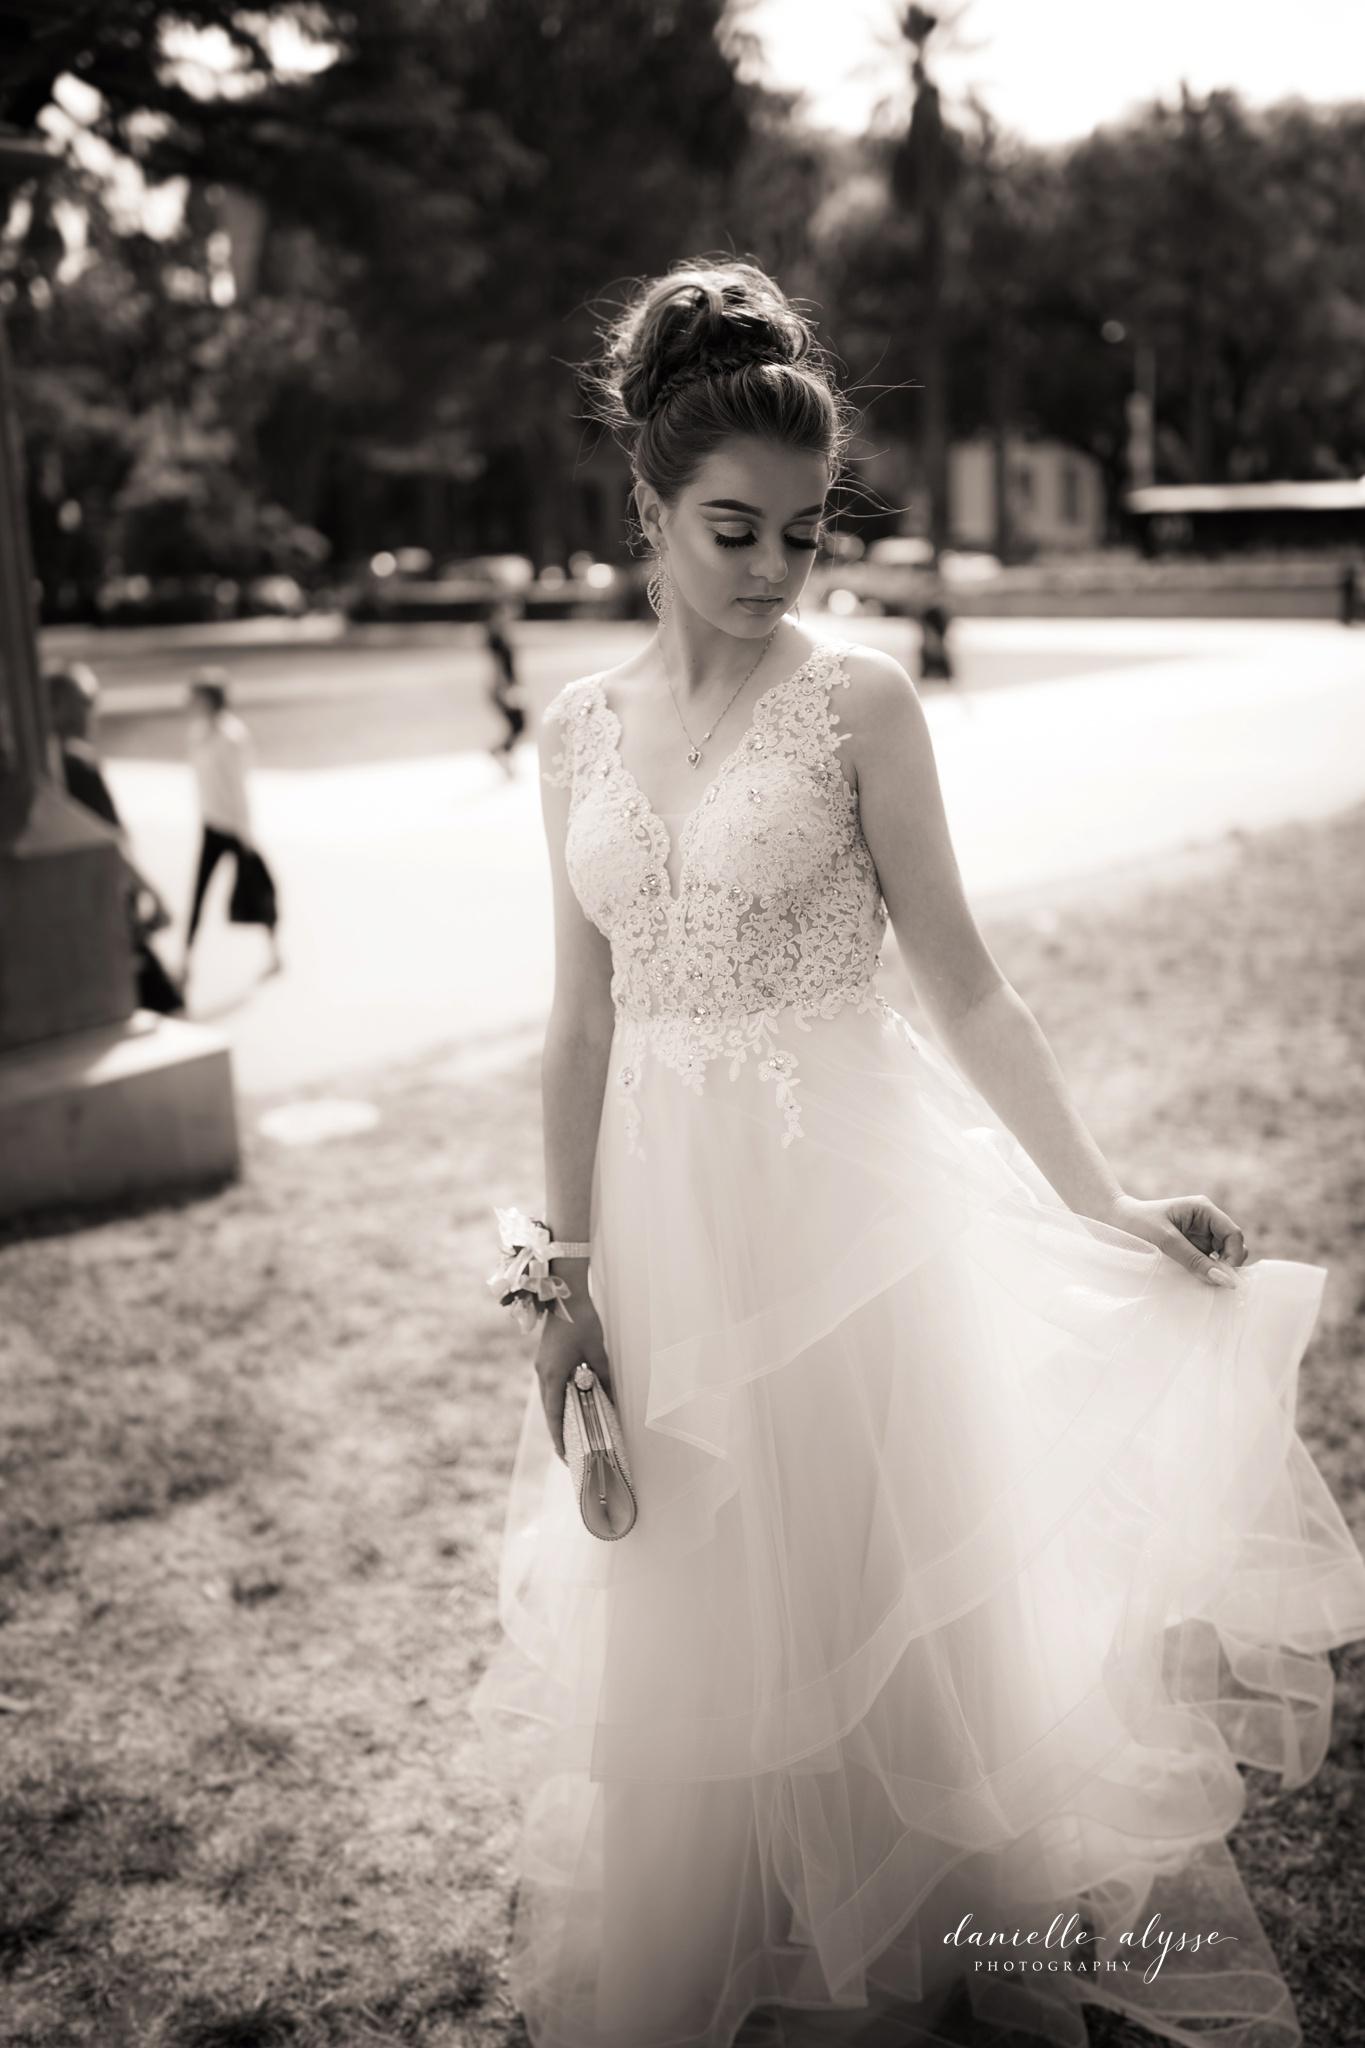 180428_prom_senior_ball_capitol_rose_danielle_alysse_photography_sacramento_photographer_blog_71_WEB.jpg